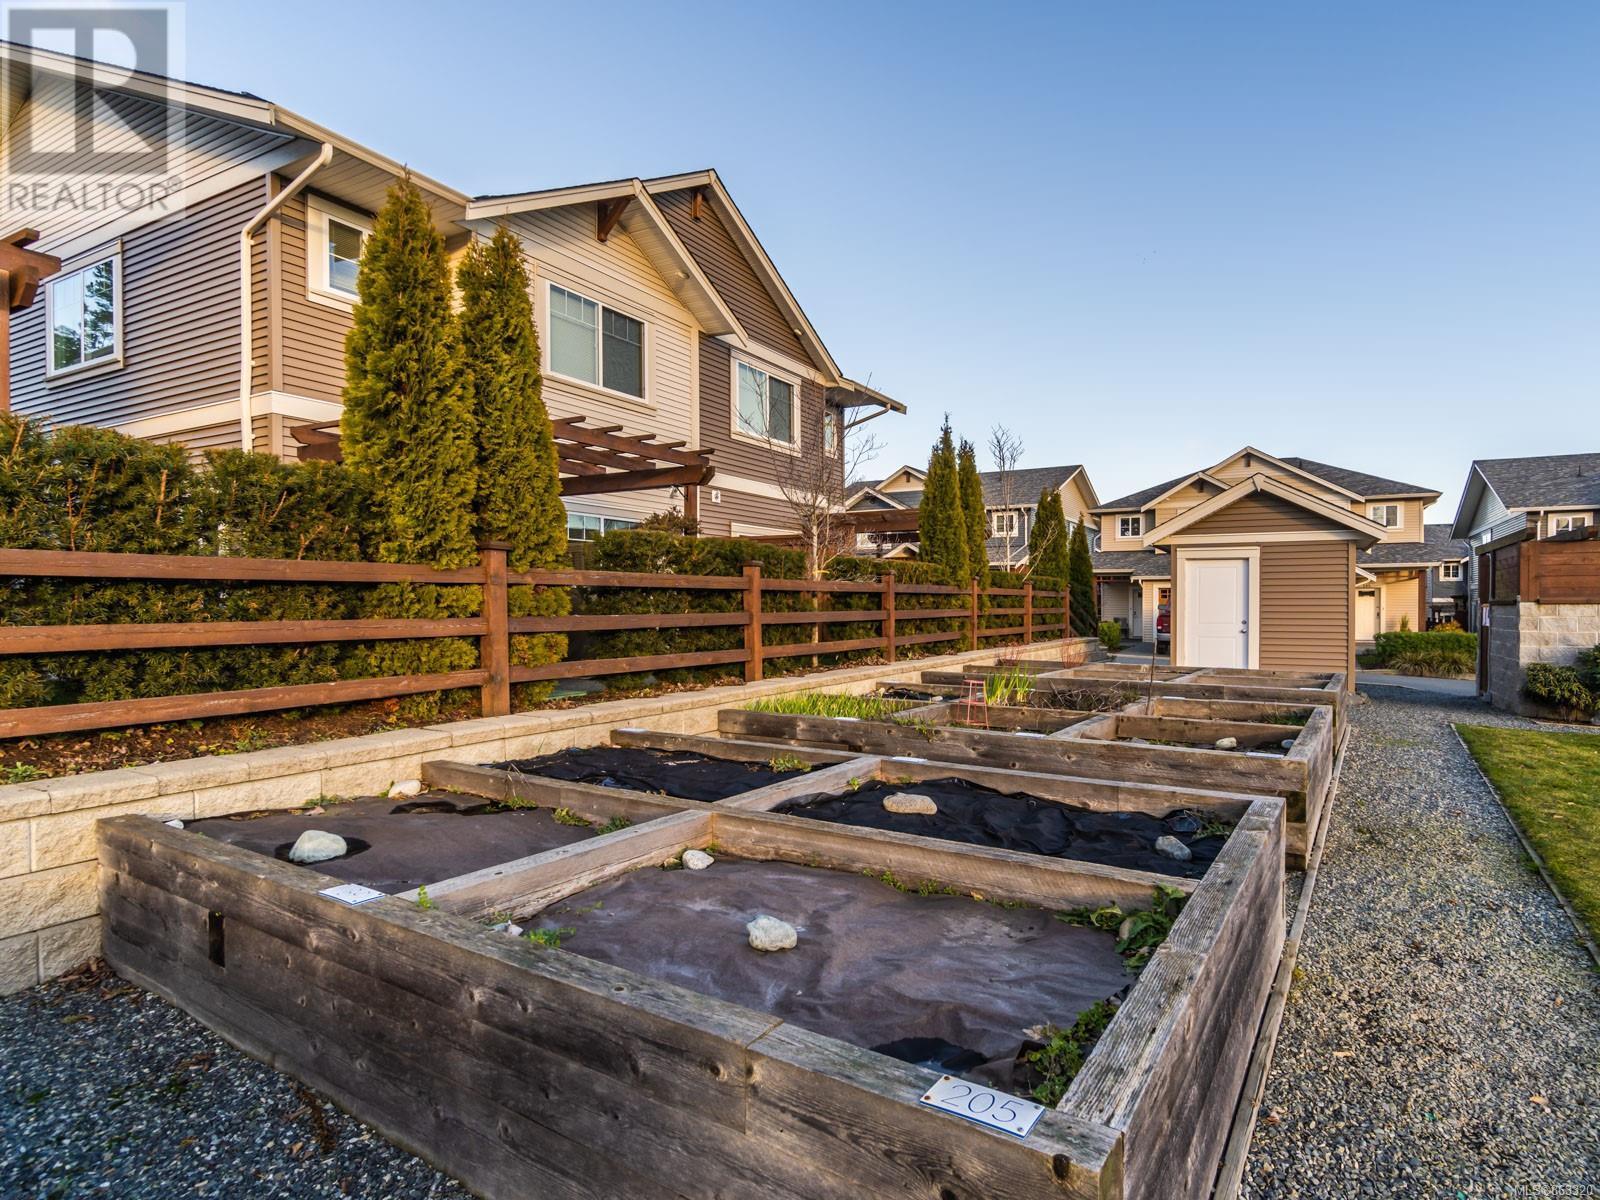 205 1720 Dufferin Cres, Nanaimo, British Columbia  V9S 0V9 - Photo 34 - 863320